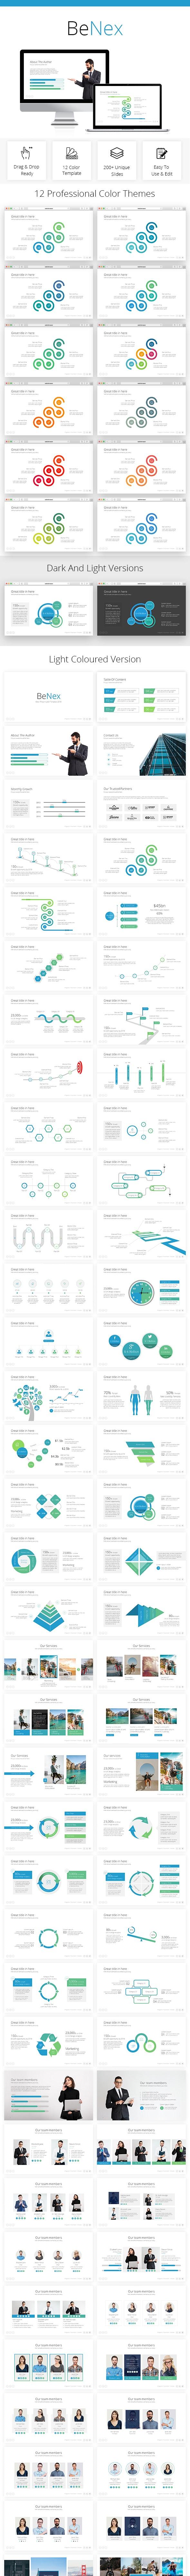 BeNex Business Powerpoint Template 2018 - PowerPoint Templates Presentation Templates